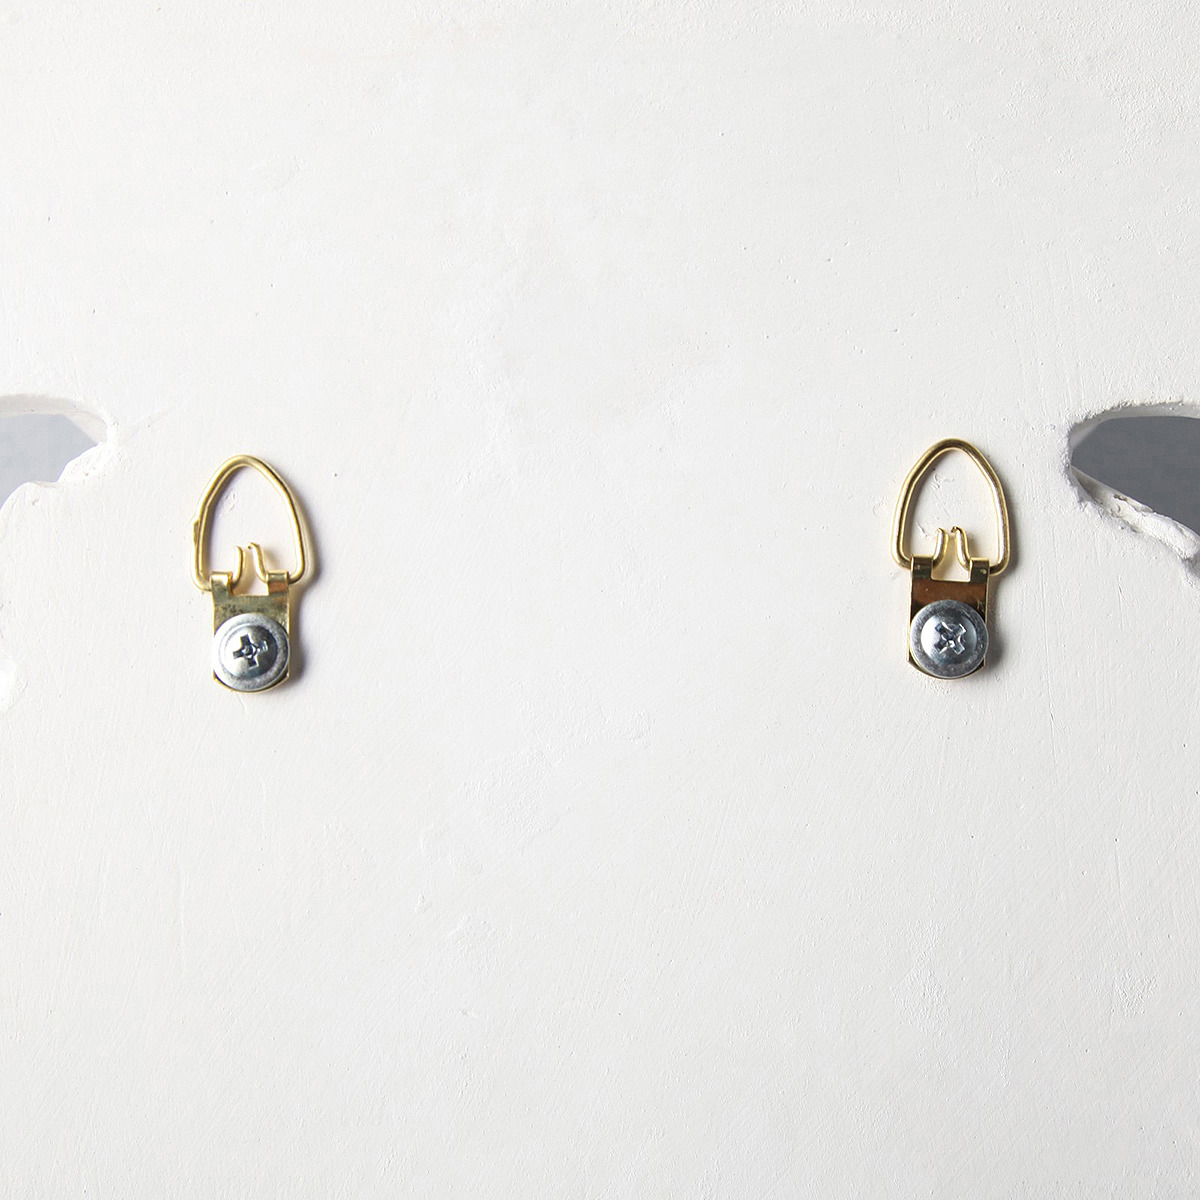 Кашпо Premium Gips Ангел №4, 3635002, белый, 27 х 37 см Premium Gips